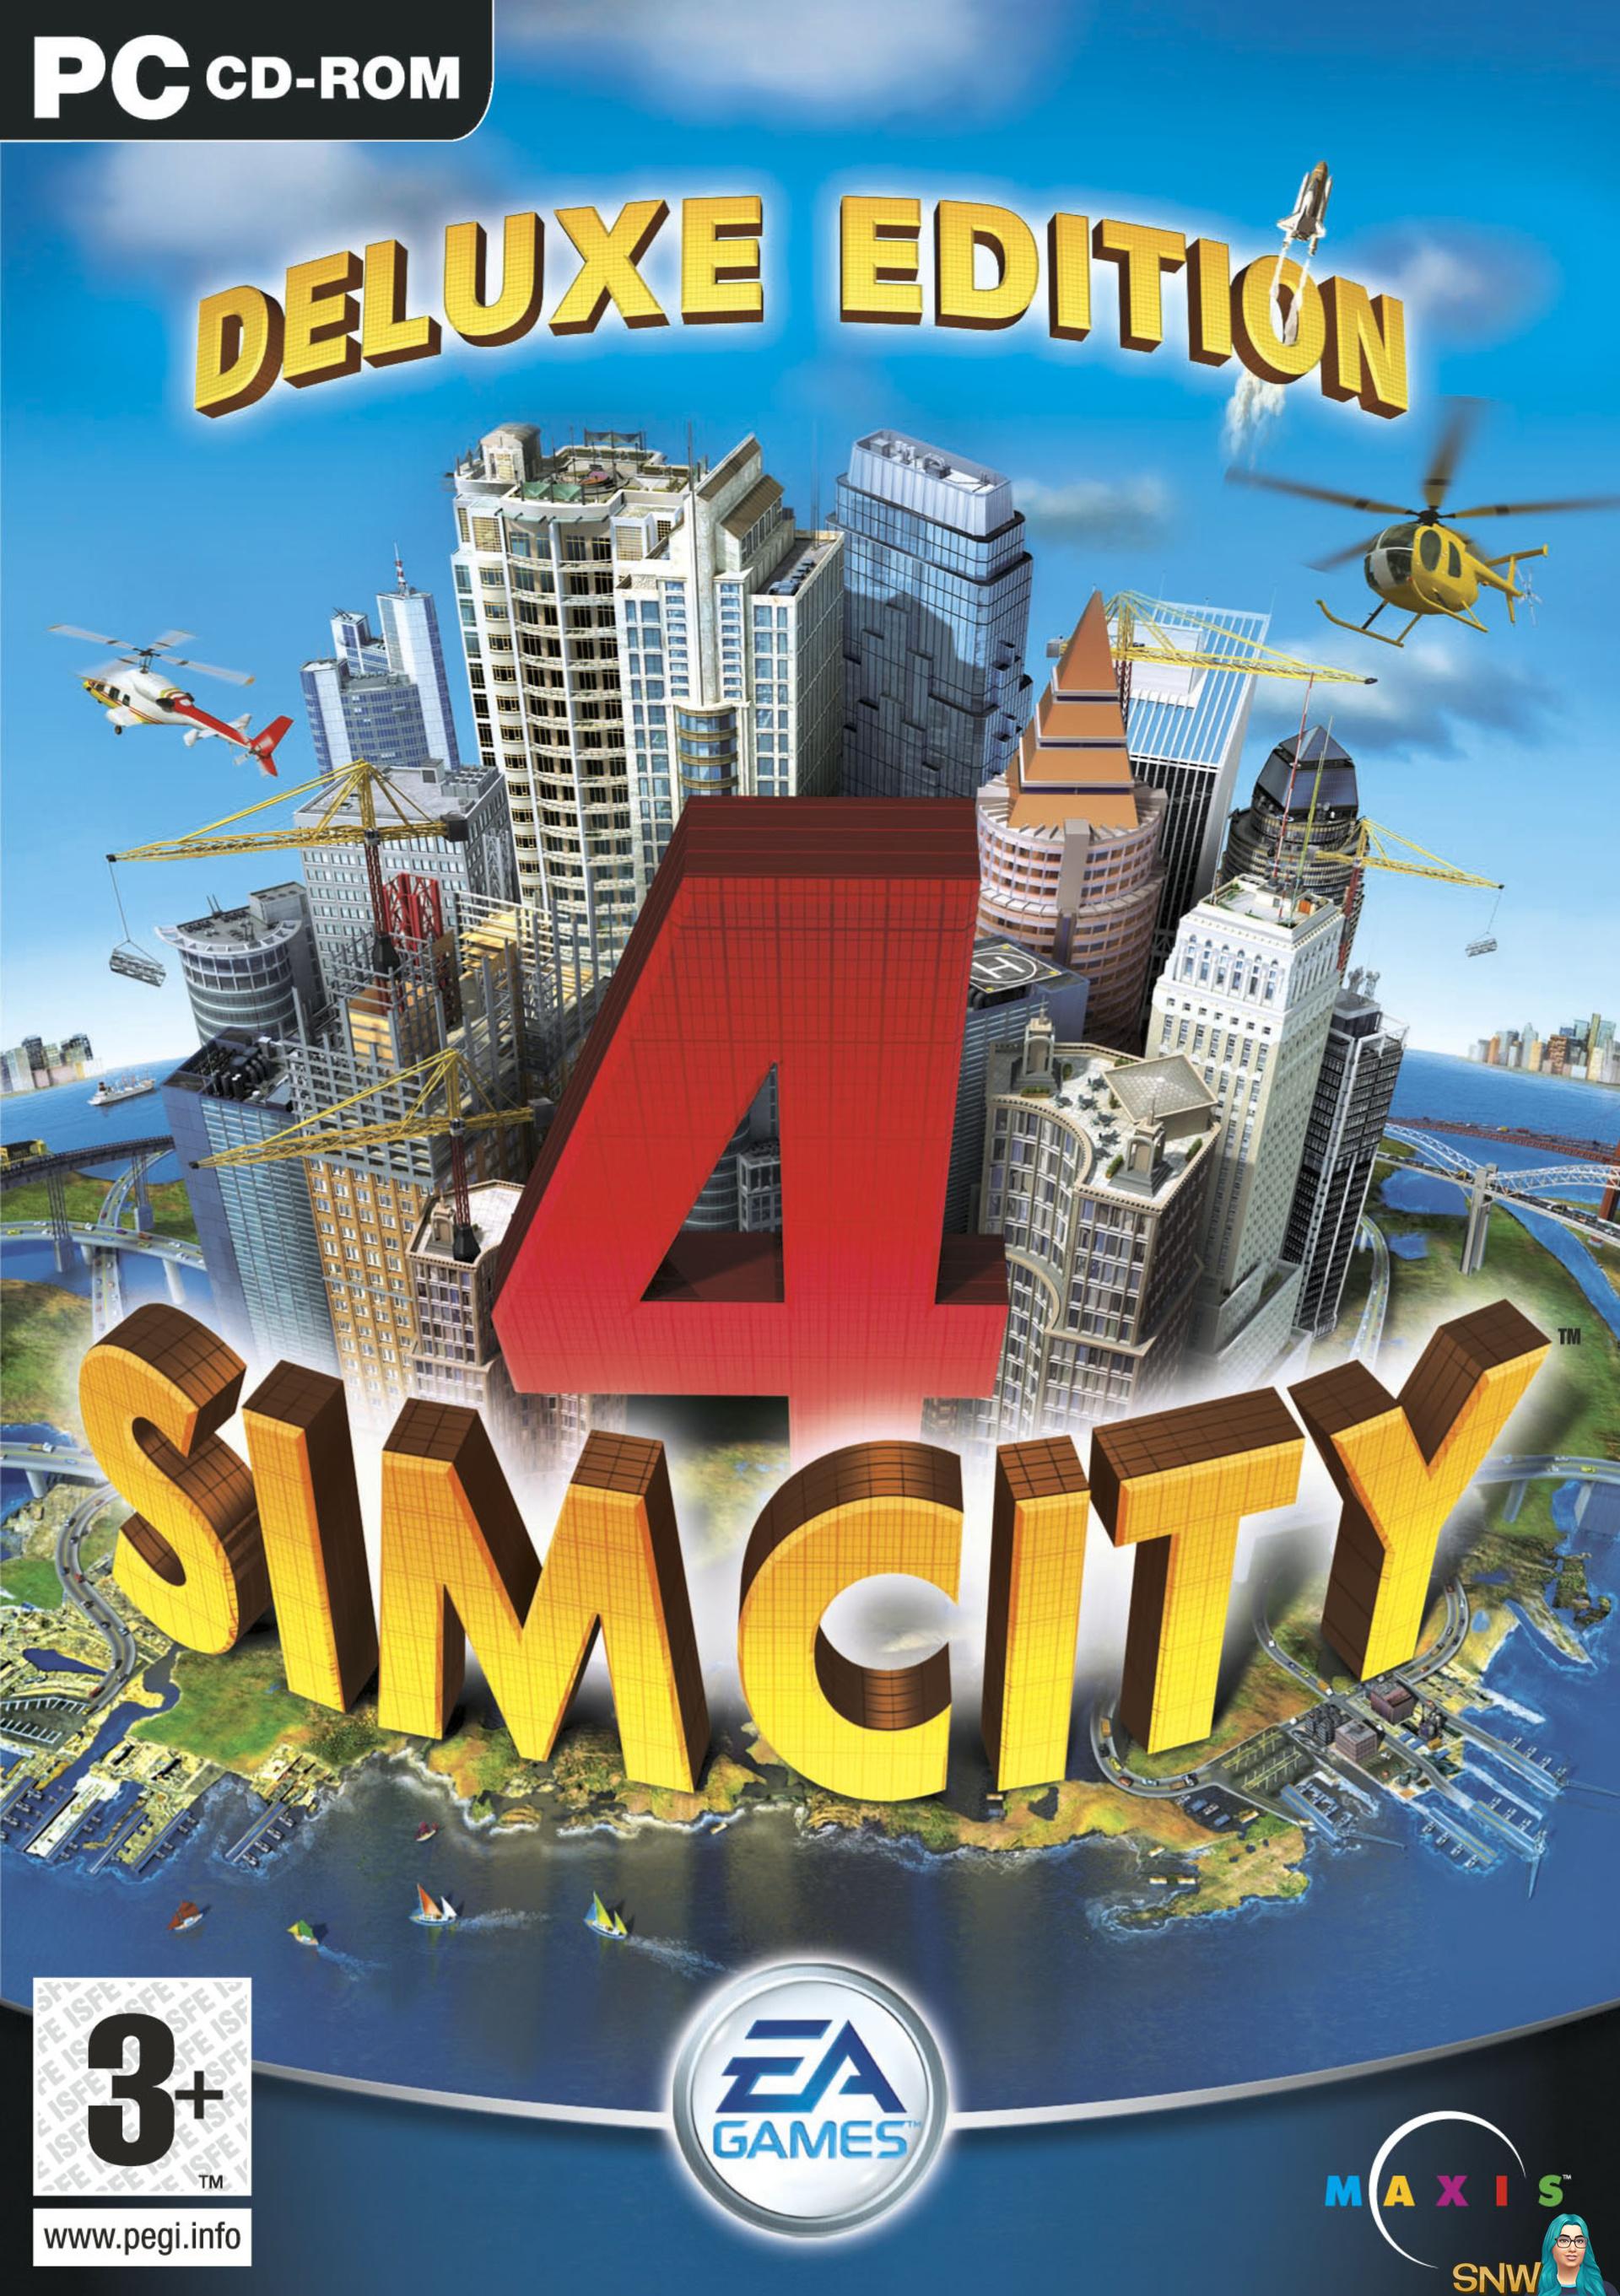 SimCity 4 Deluxe Edition box art packshot